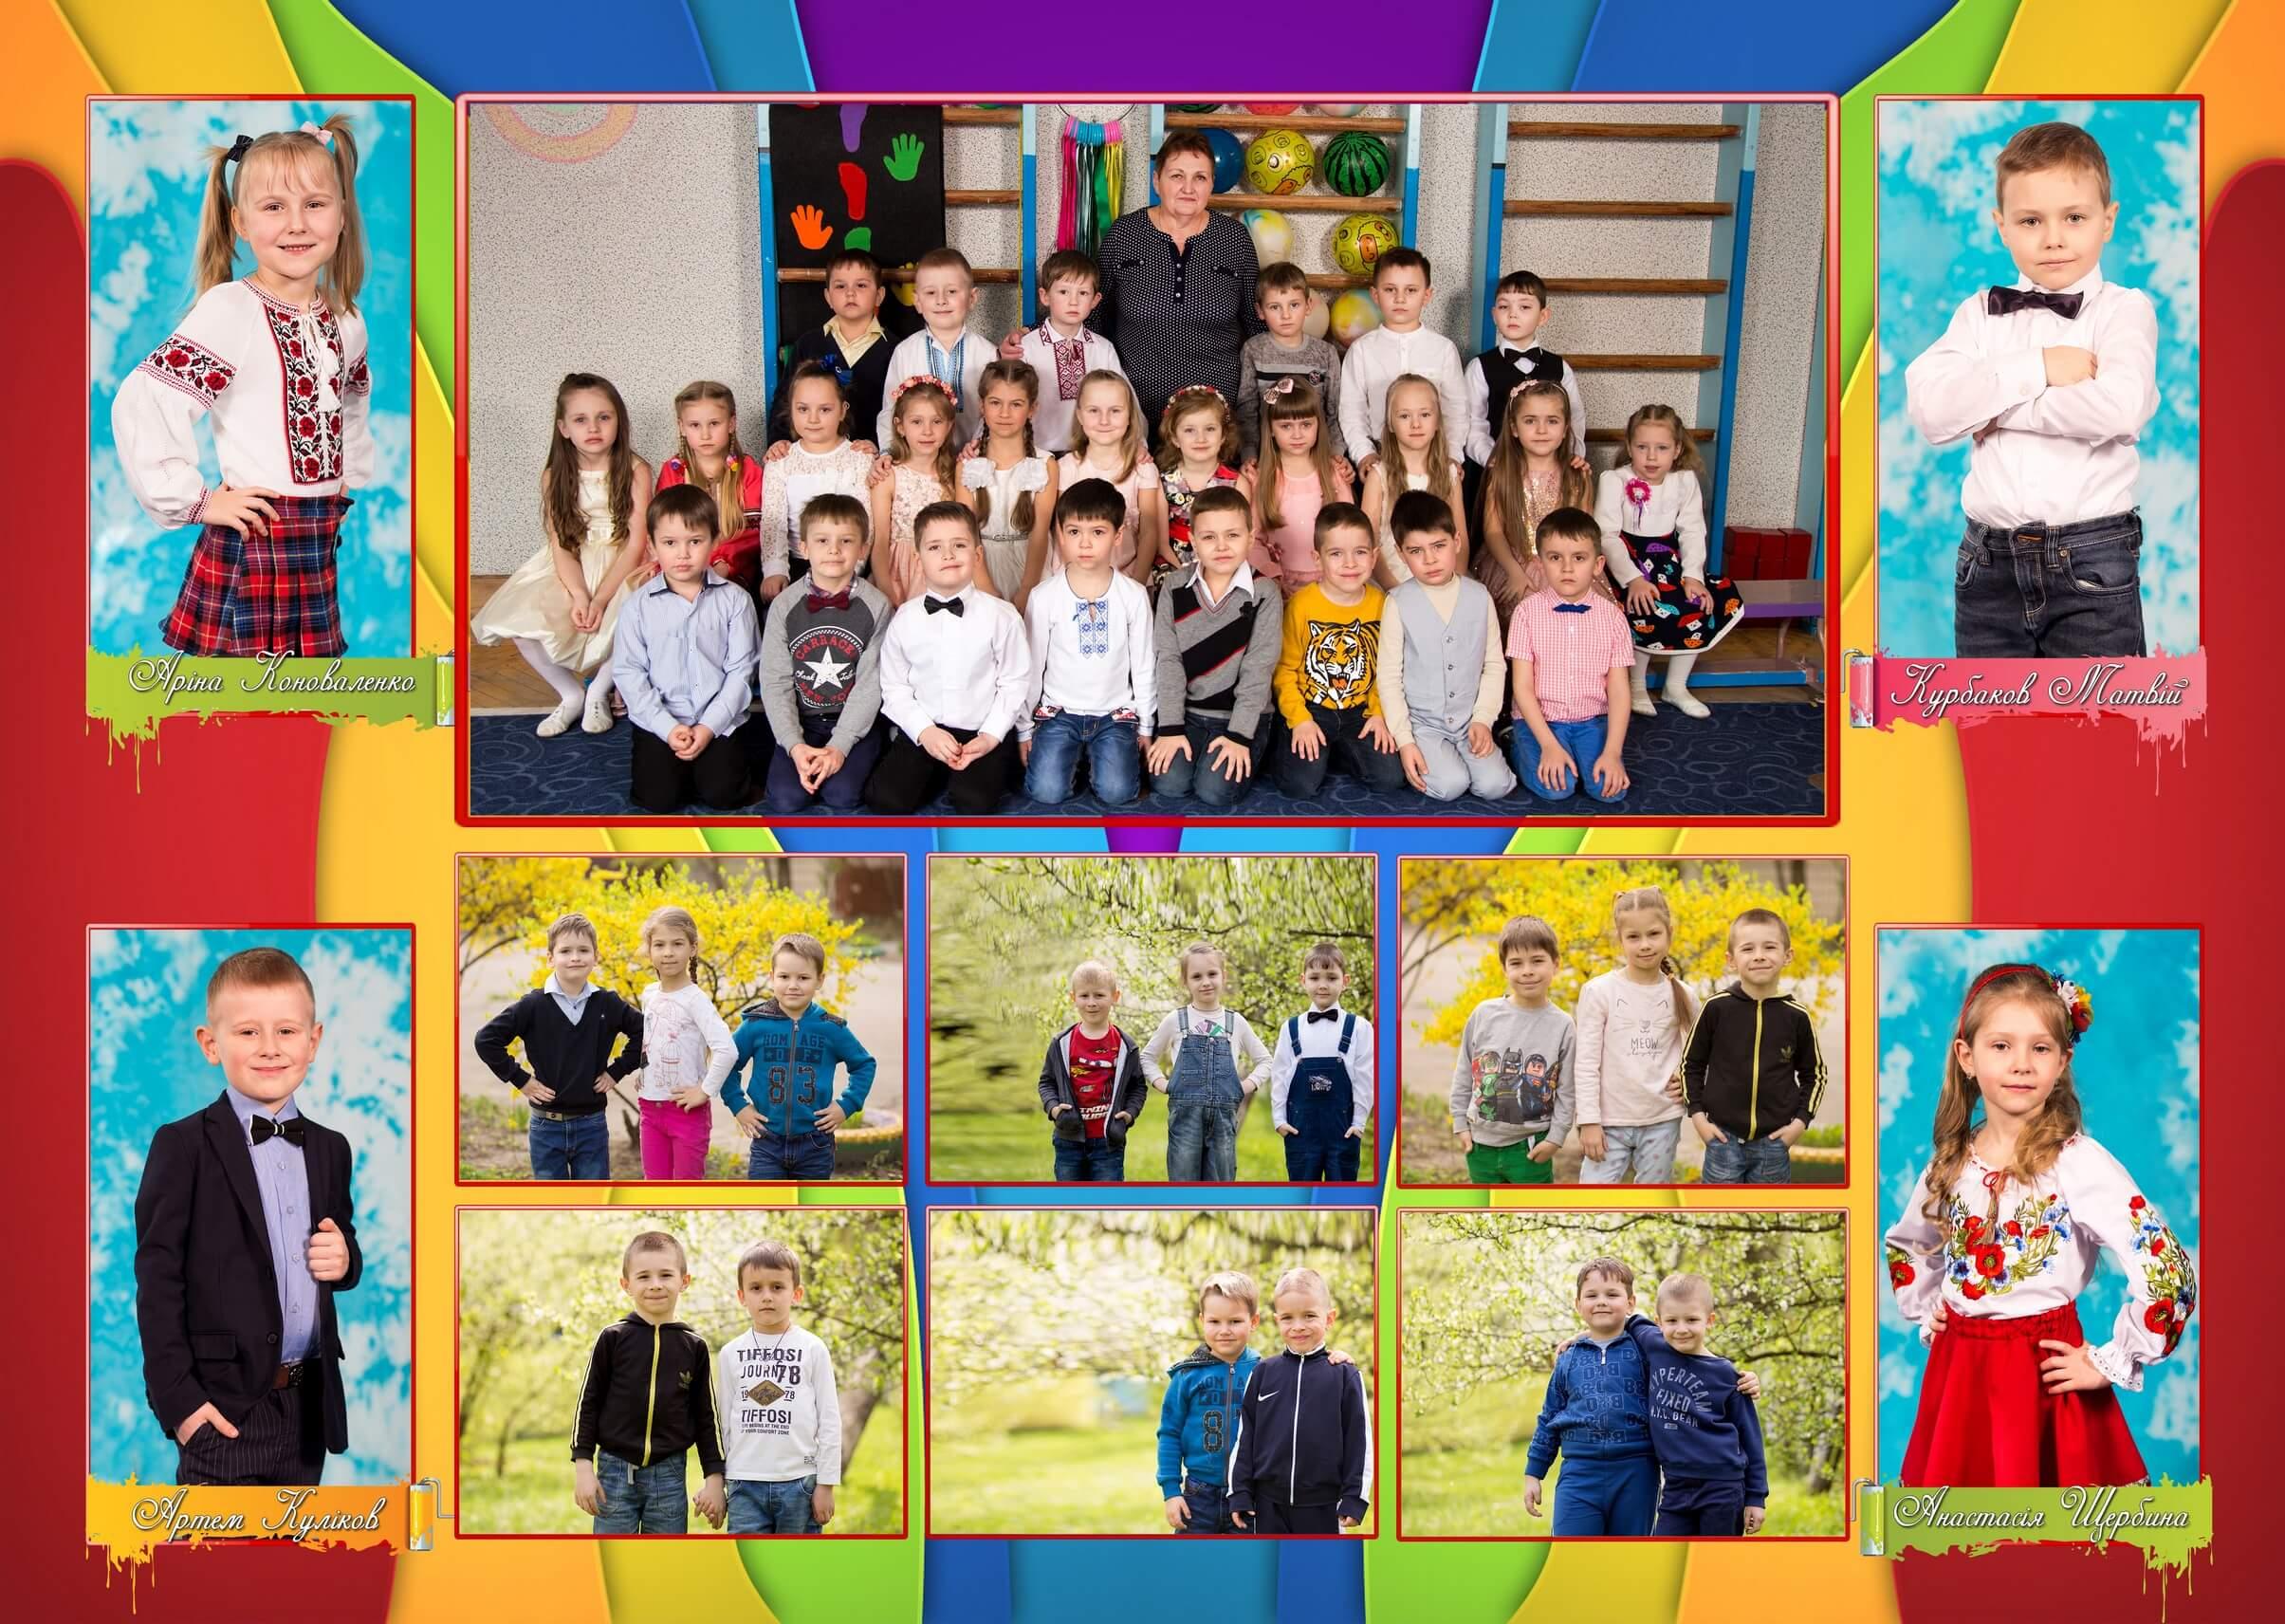 zakazat' vypusknye fotoal'bomy fotoknigi al'bomy dlja detskogo sada cena Kiev vypusknye al'bomy dlja sadika kiev Vypusknoj al'bom v detskij sad Kieva Detskij fotograf Kiev